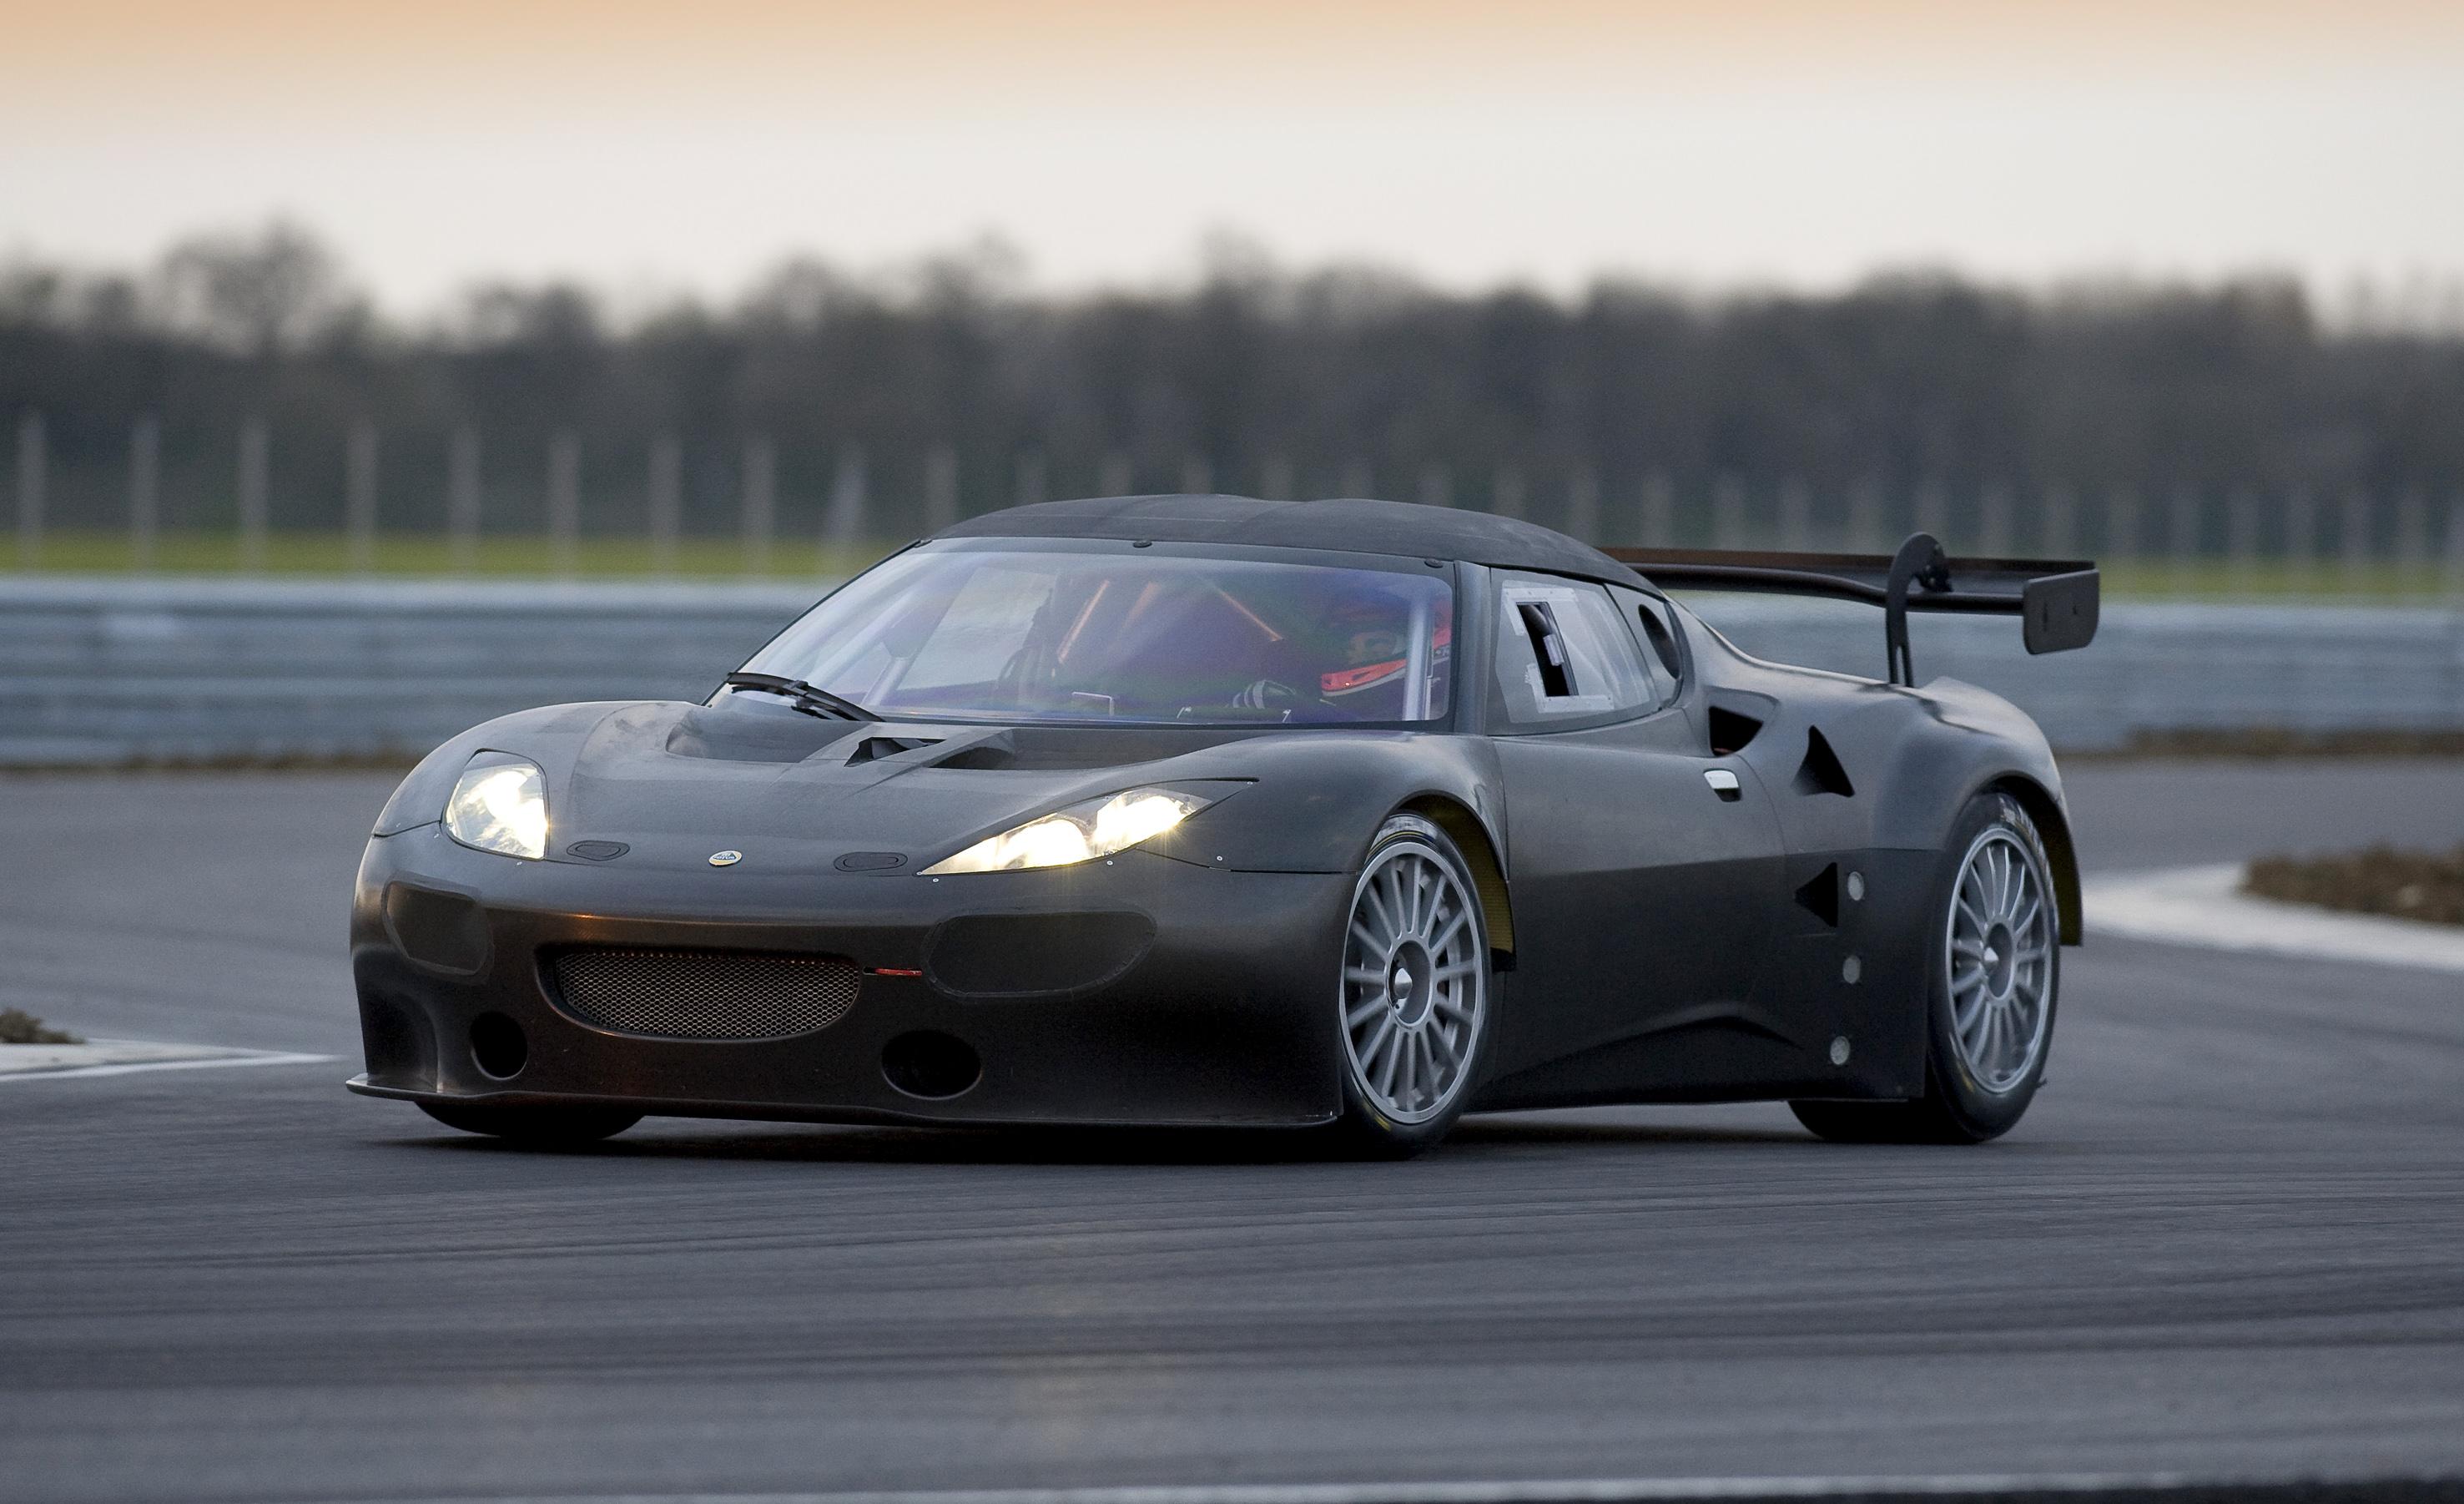 https://get.wallhere.com/photo/car-vehicle-sports-car-2013-Lotus-Lotus-Evora-netcarshow-netcar-car-images-car-photo-Evora-GTE-race-car-supercar-land-vehicle-automotive-design-race-car-automobile-make-luxury-vehicle-430118.jpg